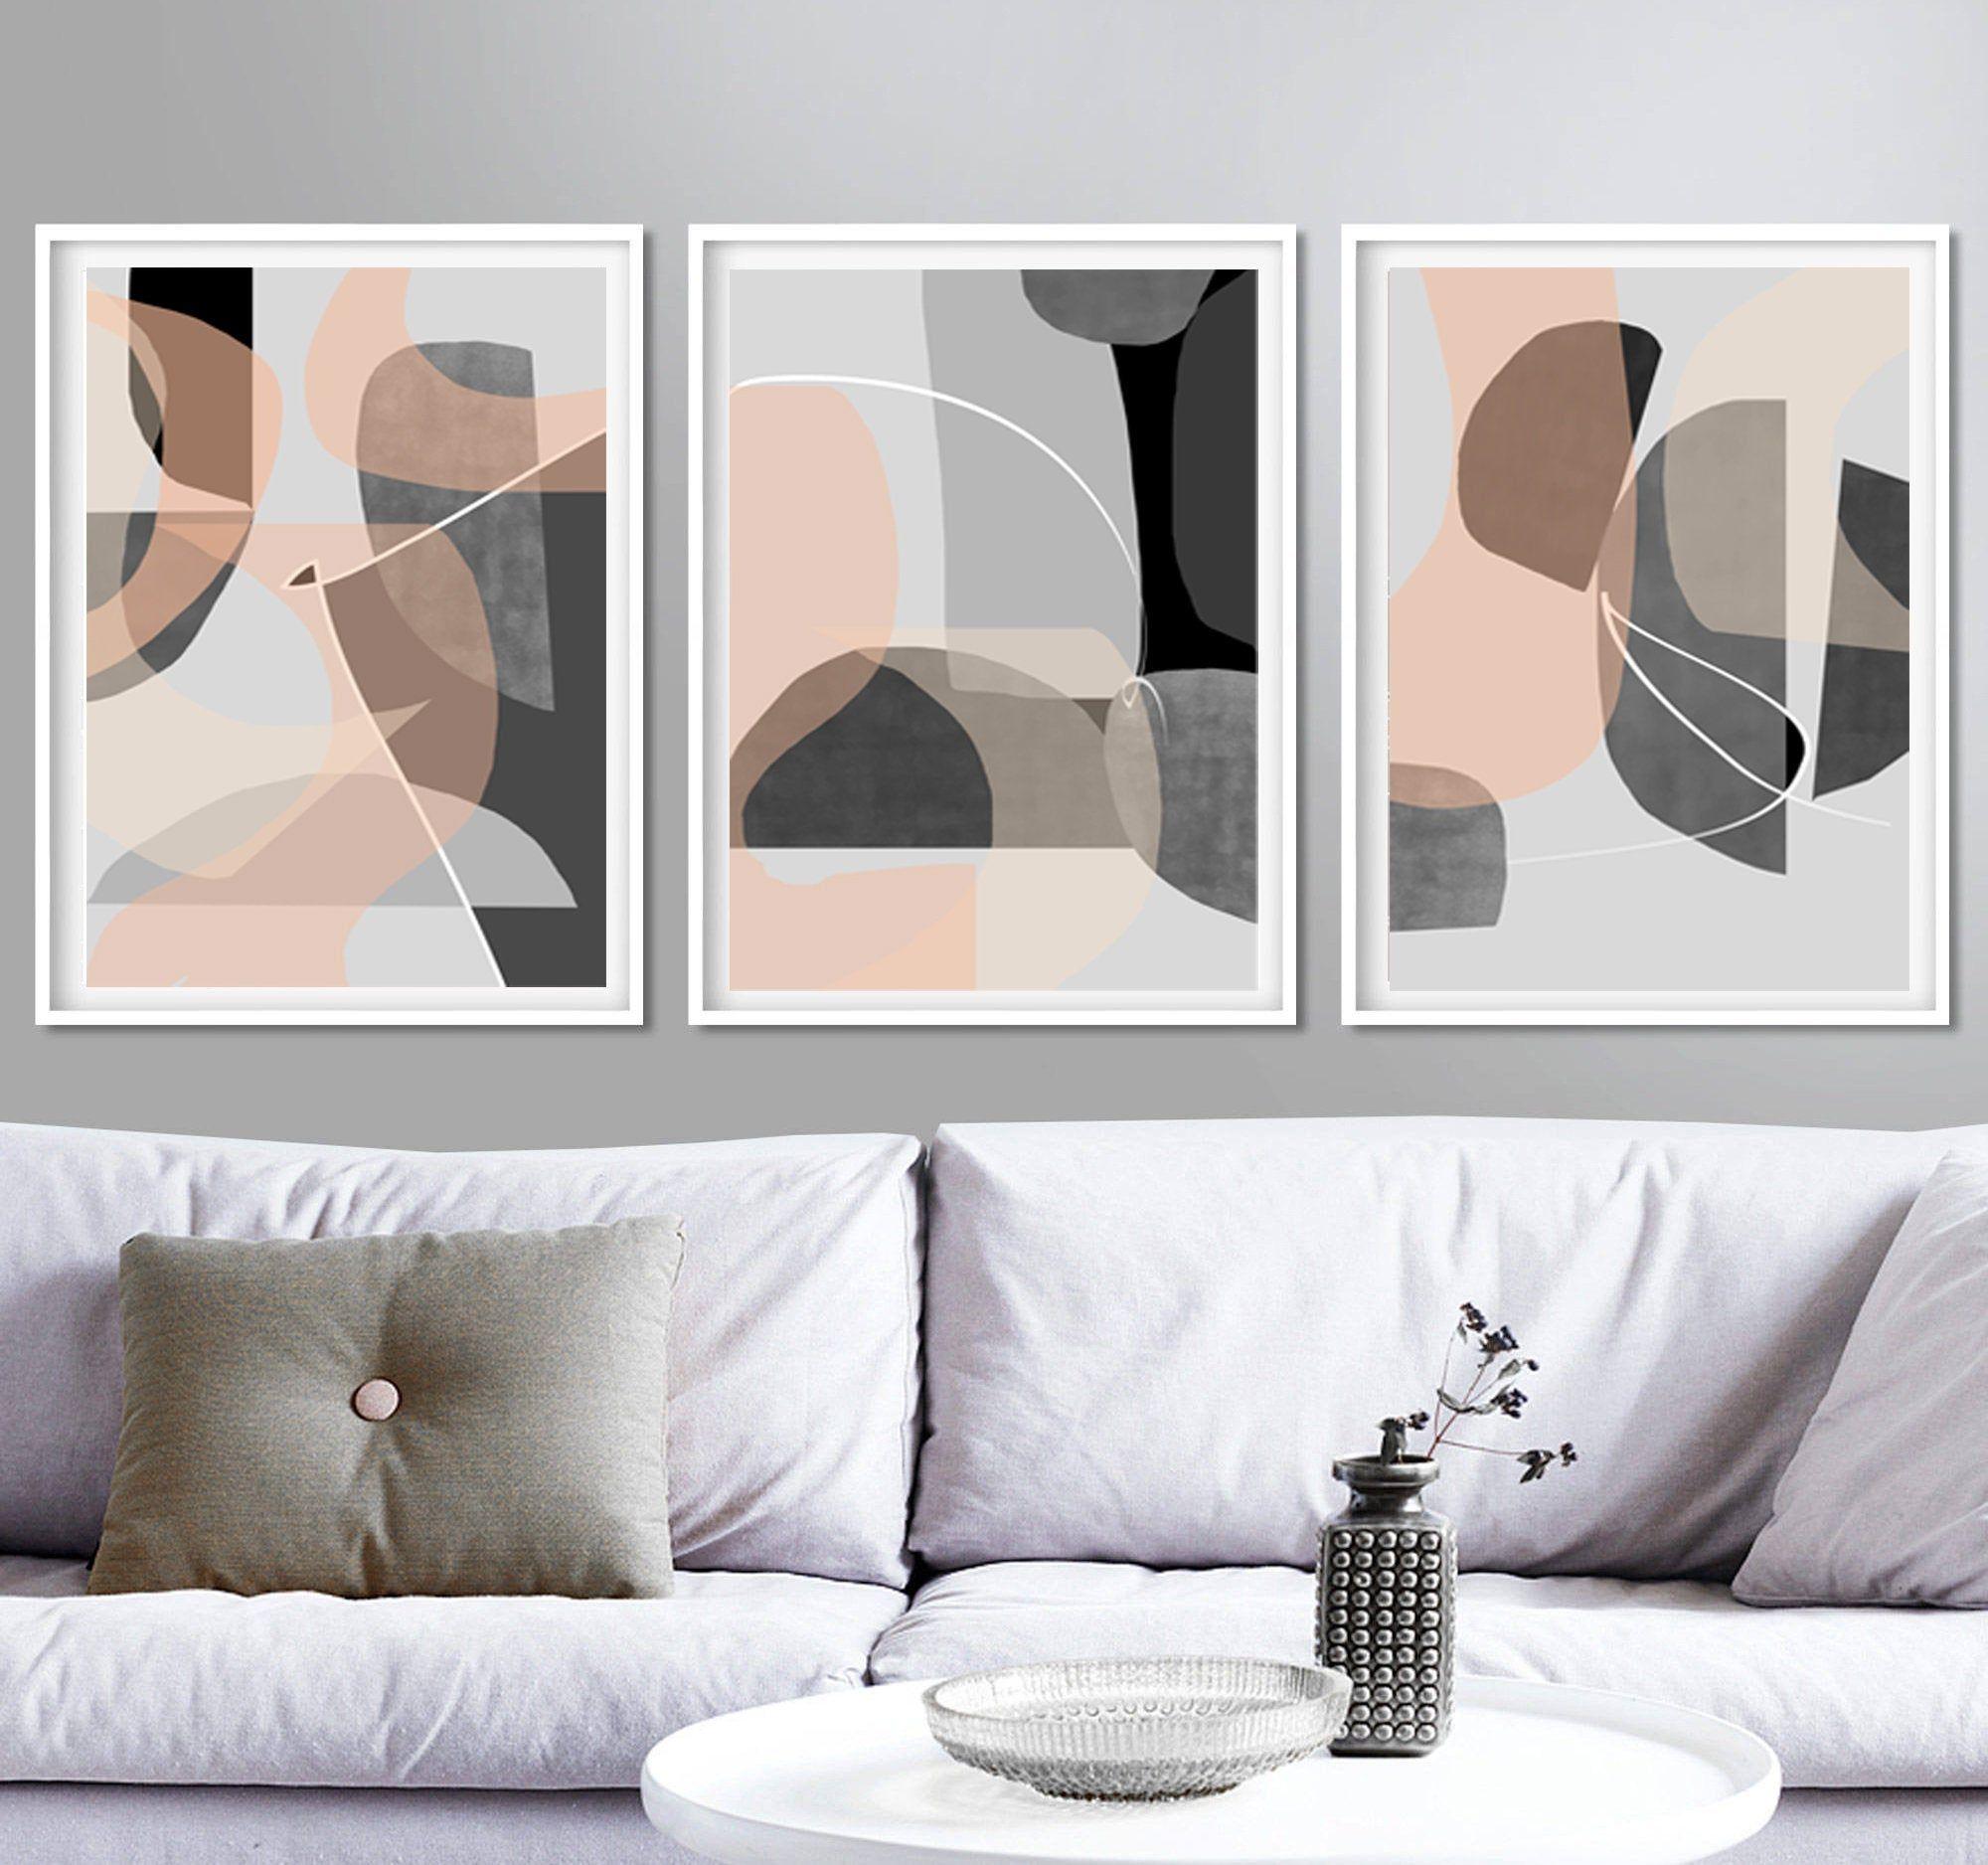 Modern Triptych Grey Abstract Art 3 Piece Wall Art Gray Pink Etsy In 2021 Grey Abstract Art Wall Art Decor Living Room Diy Canvas Wall Art